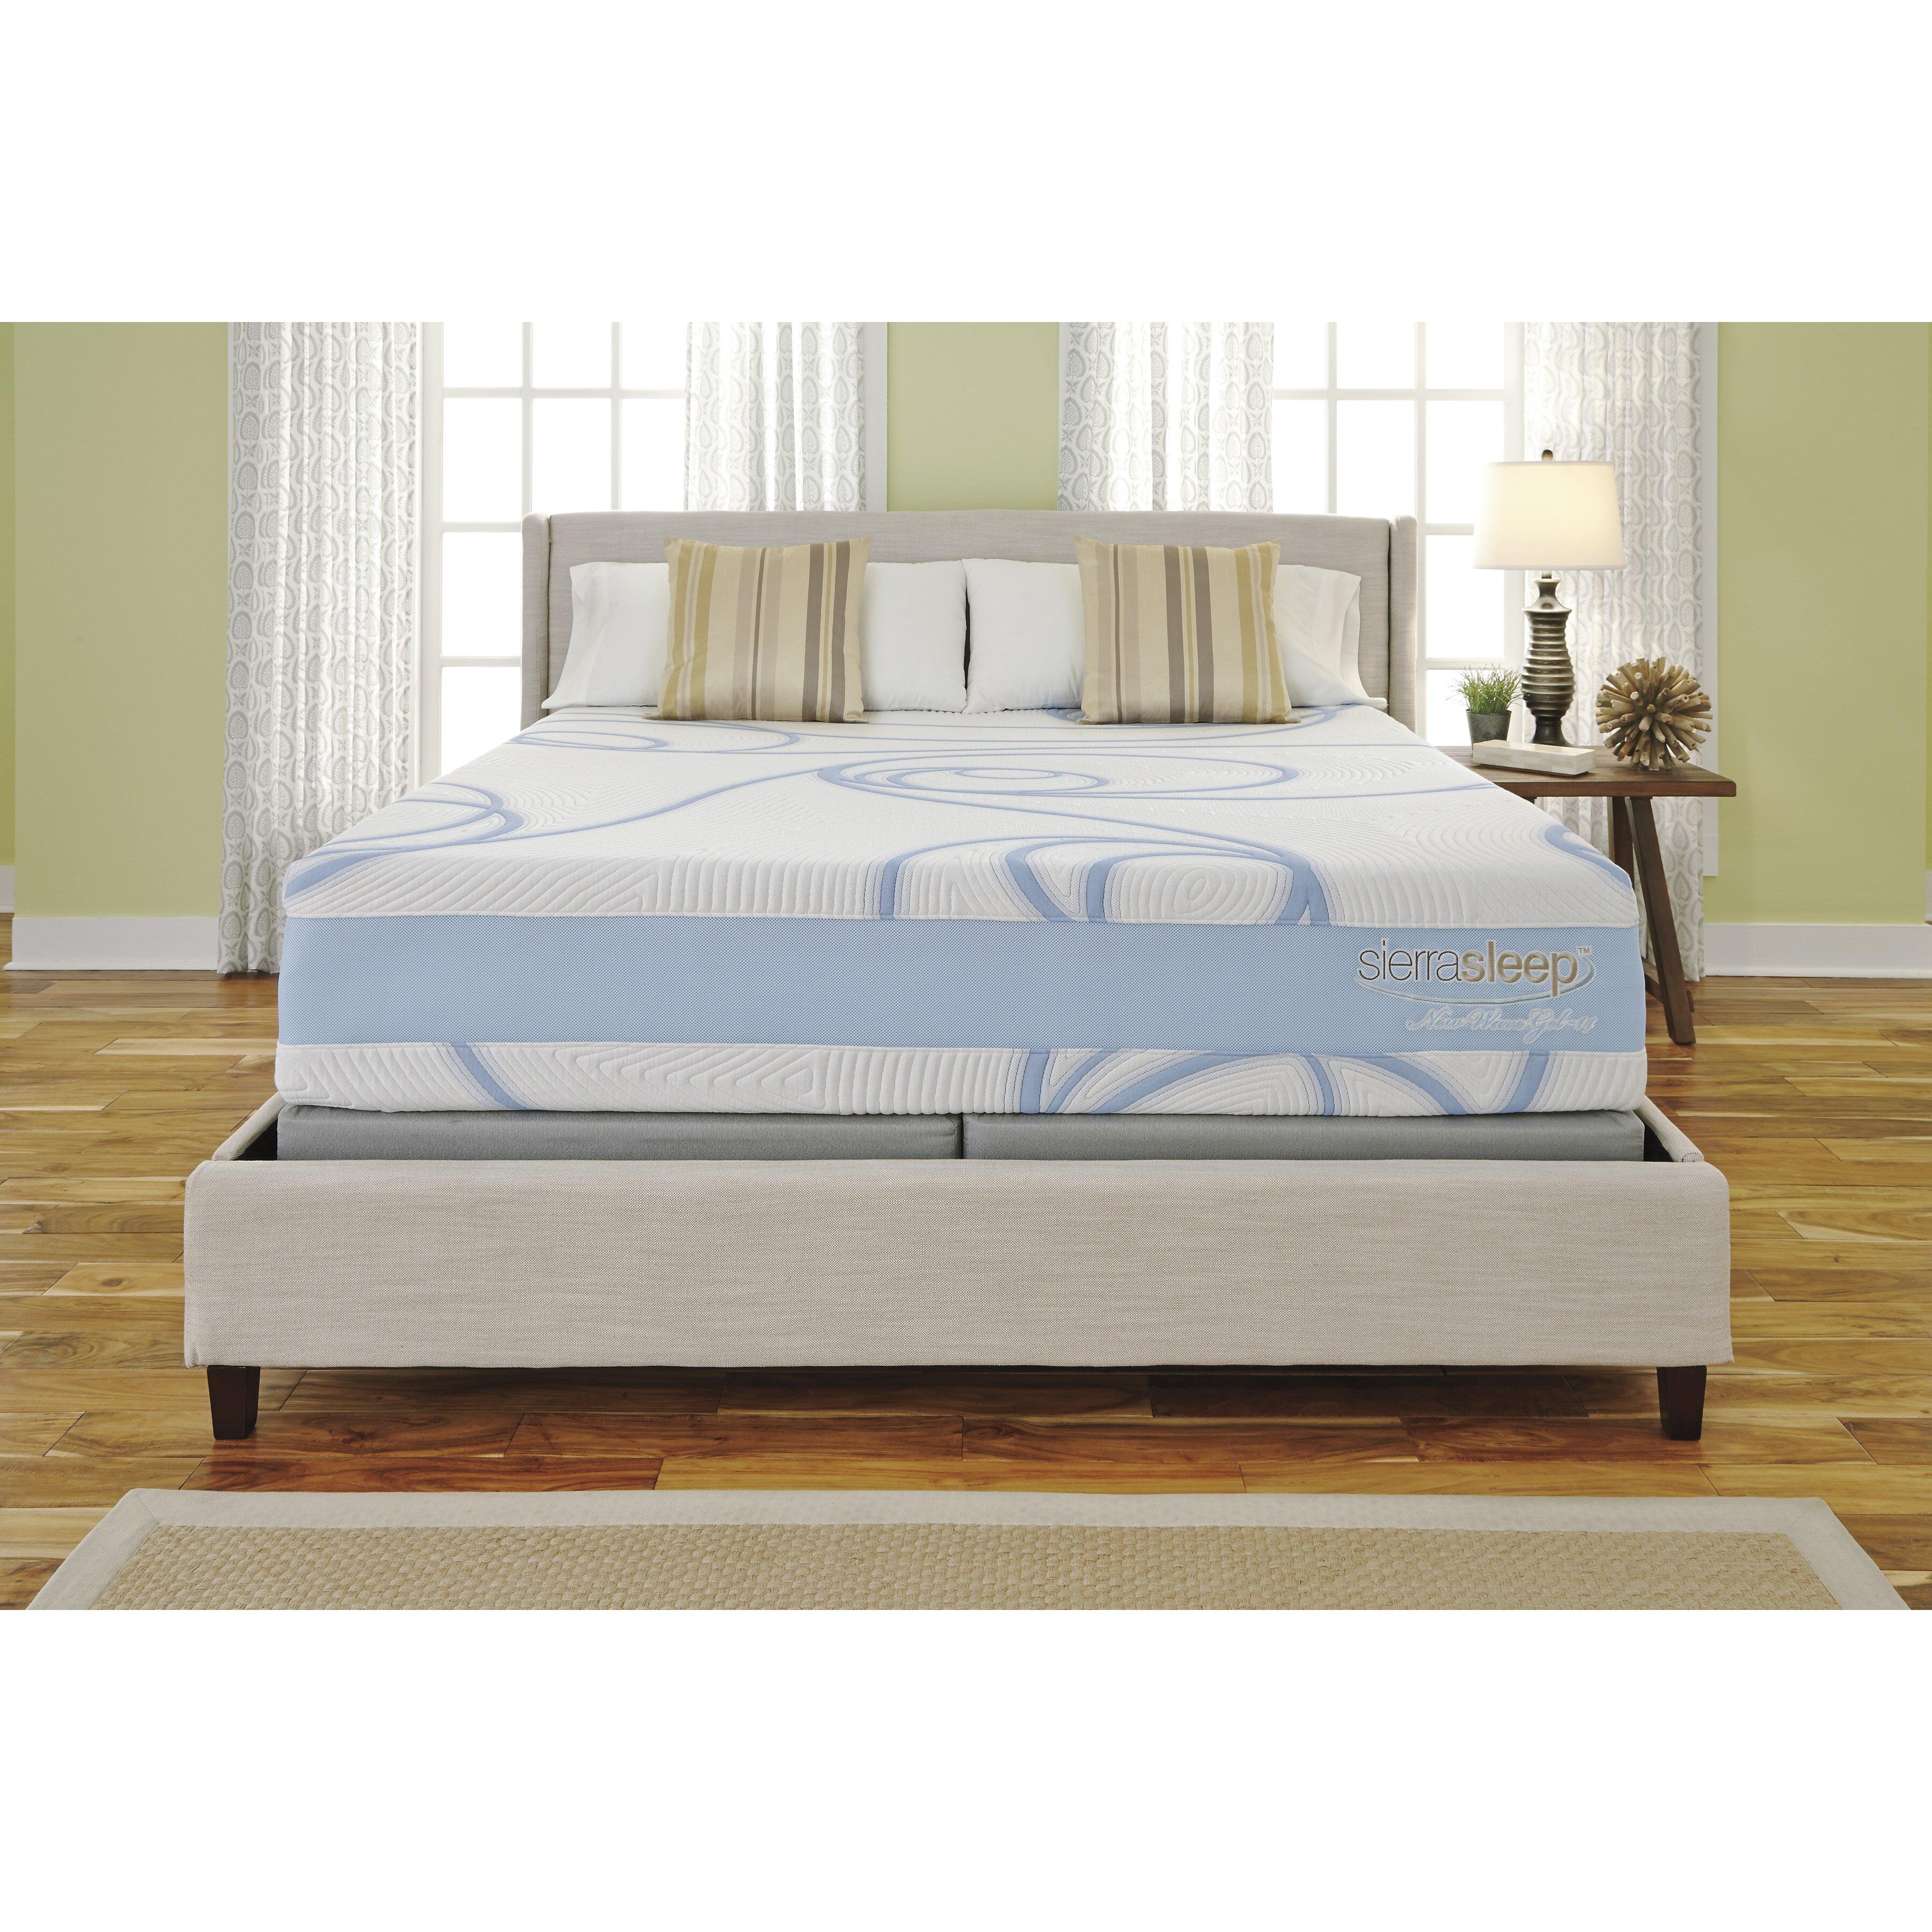 sierra sleep split king boxspring reviews. Black Bedroom Furniture Sets. Home Design Ideas